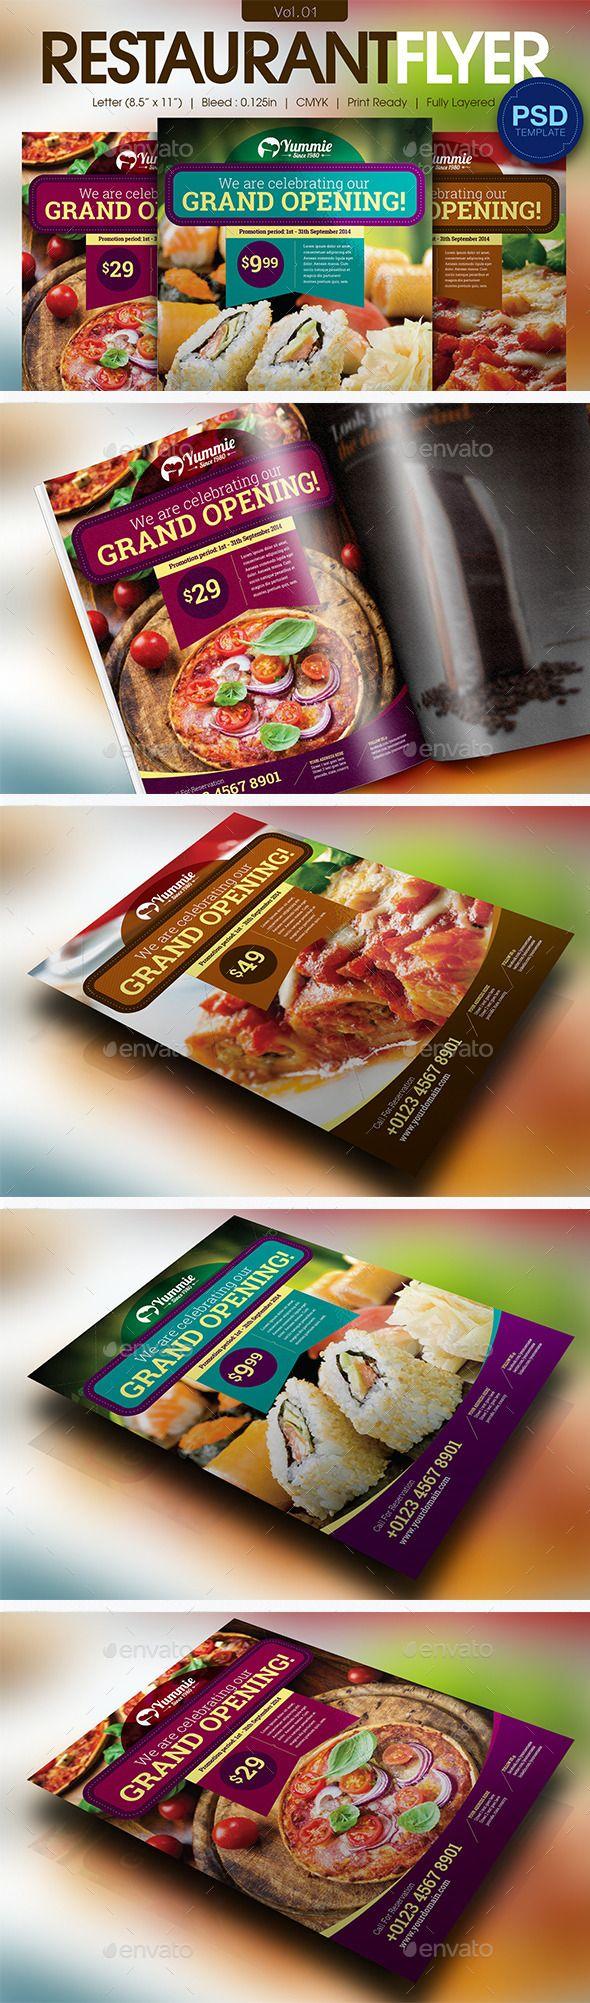 Restaurant Flyer Tempalte #design #foodflyer Download: http://graphicriver.net/item/restaurant-flyer-vol01/11595821?ref=ksioks